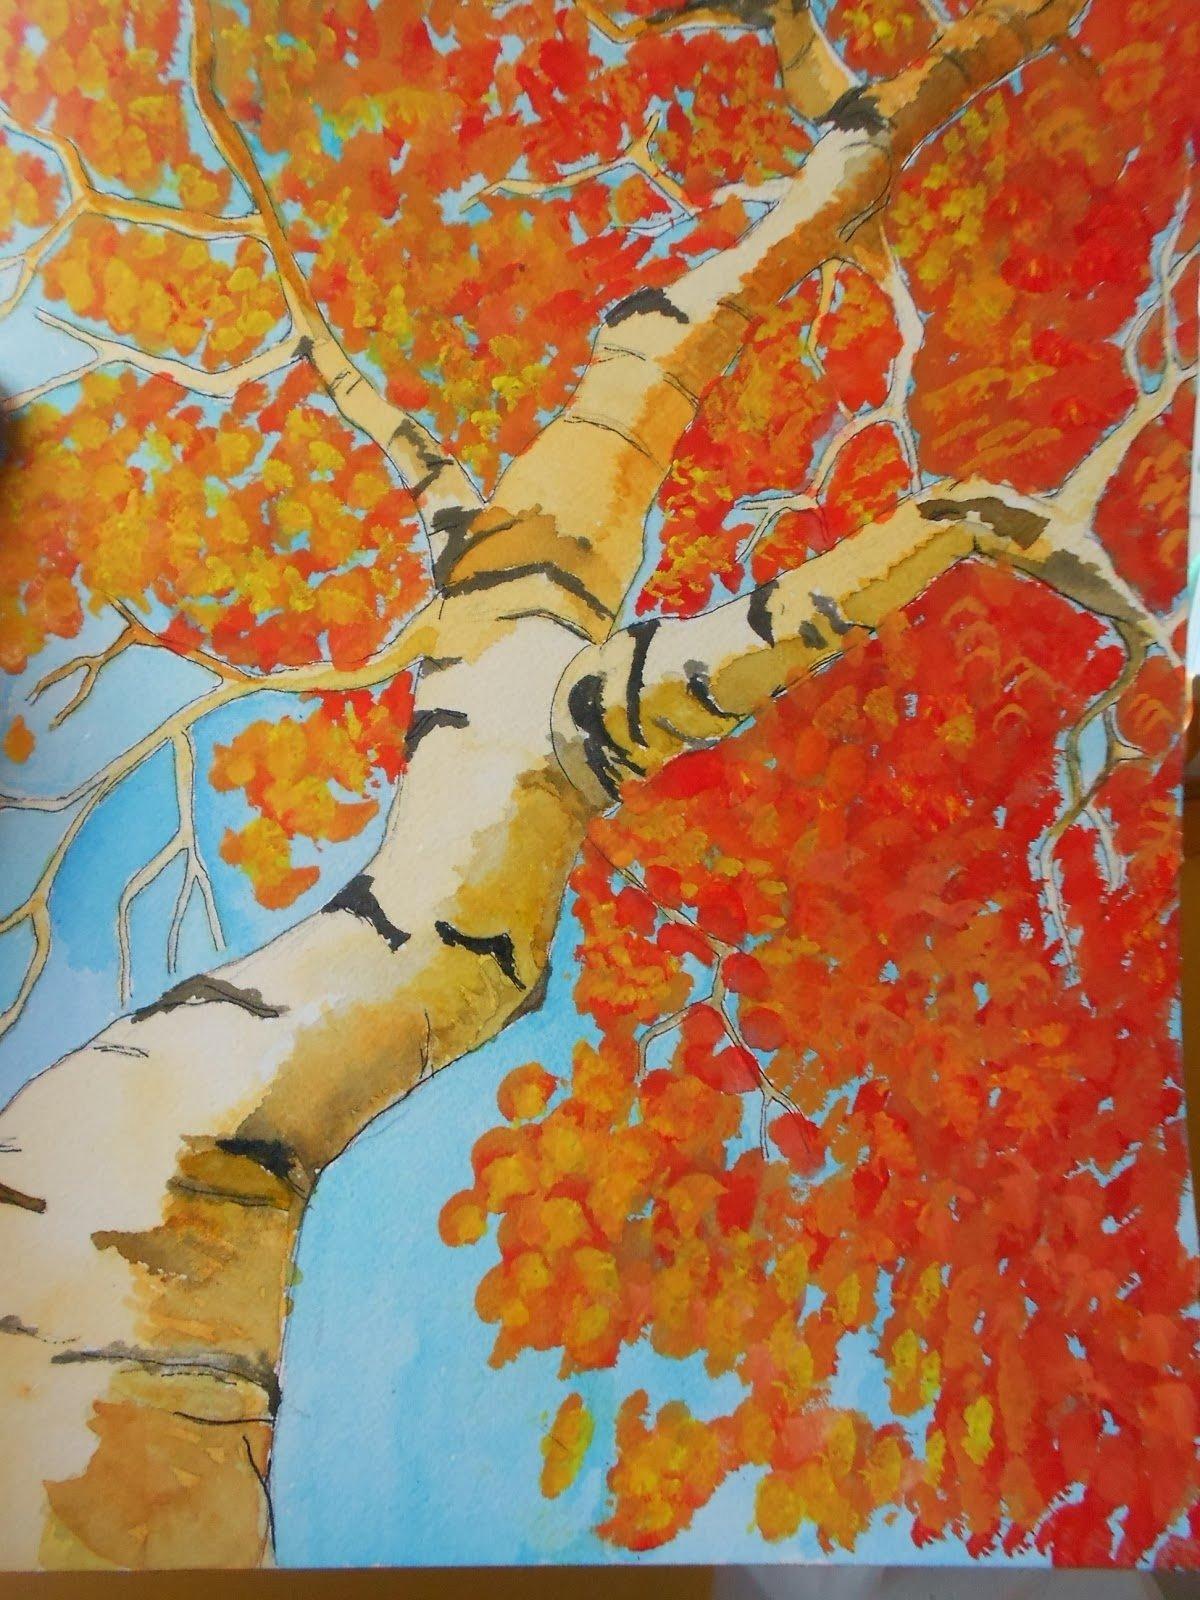 10 Attractive Art Project Ideas For Kids autumn landscape art project ideas artmuse67 2021